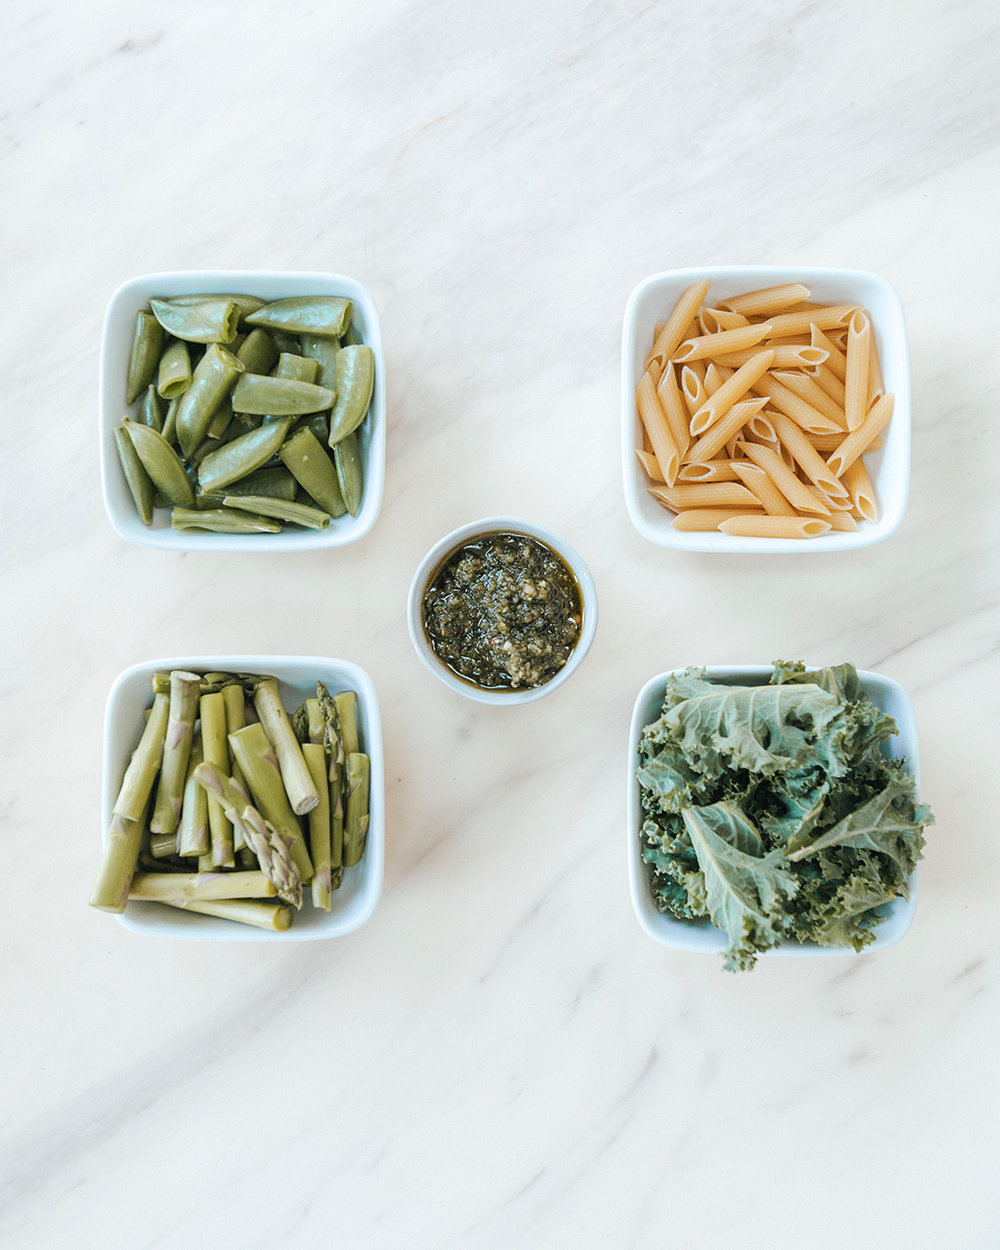 The-Oily-Home-Companion-Recipe-Pesto-penne-gluten-free-gf-pasta-spring-vegetables-asparagus-kale-garlic-basil-lemon-vitality-essential-oil-pesto-Summer-Spring-Dish-Meal-Ingredients.jpg